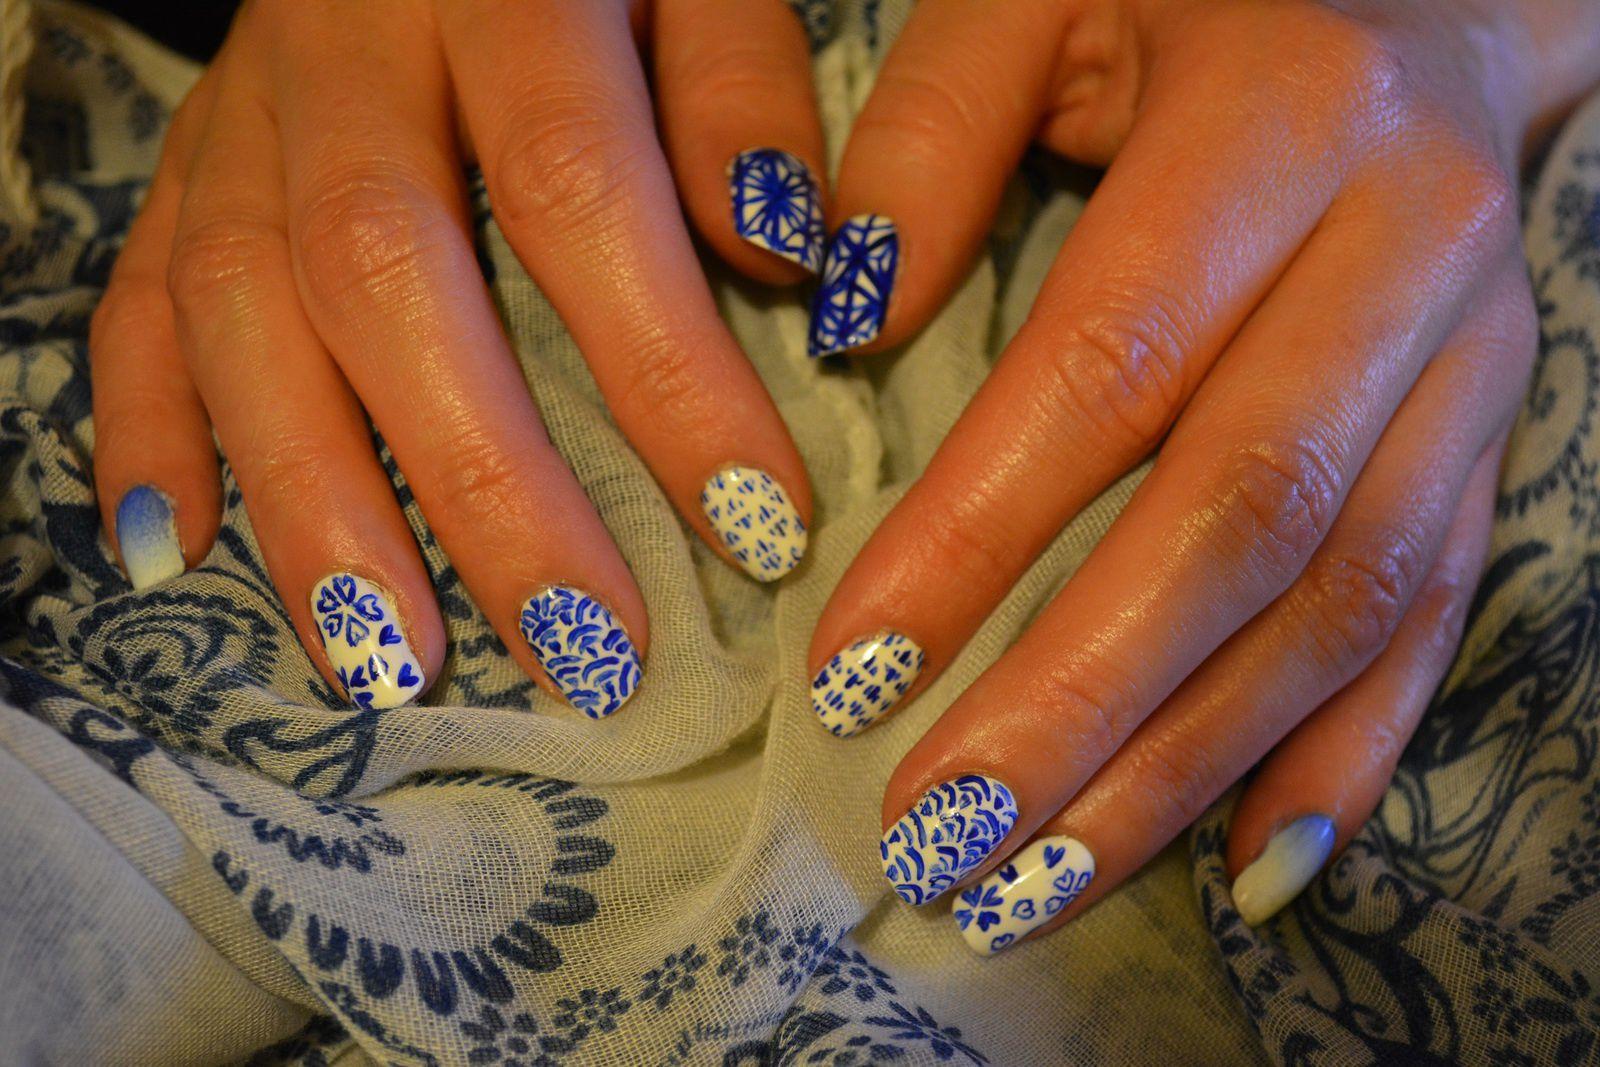 Nail Art - Bleu et Blanc